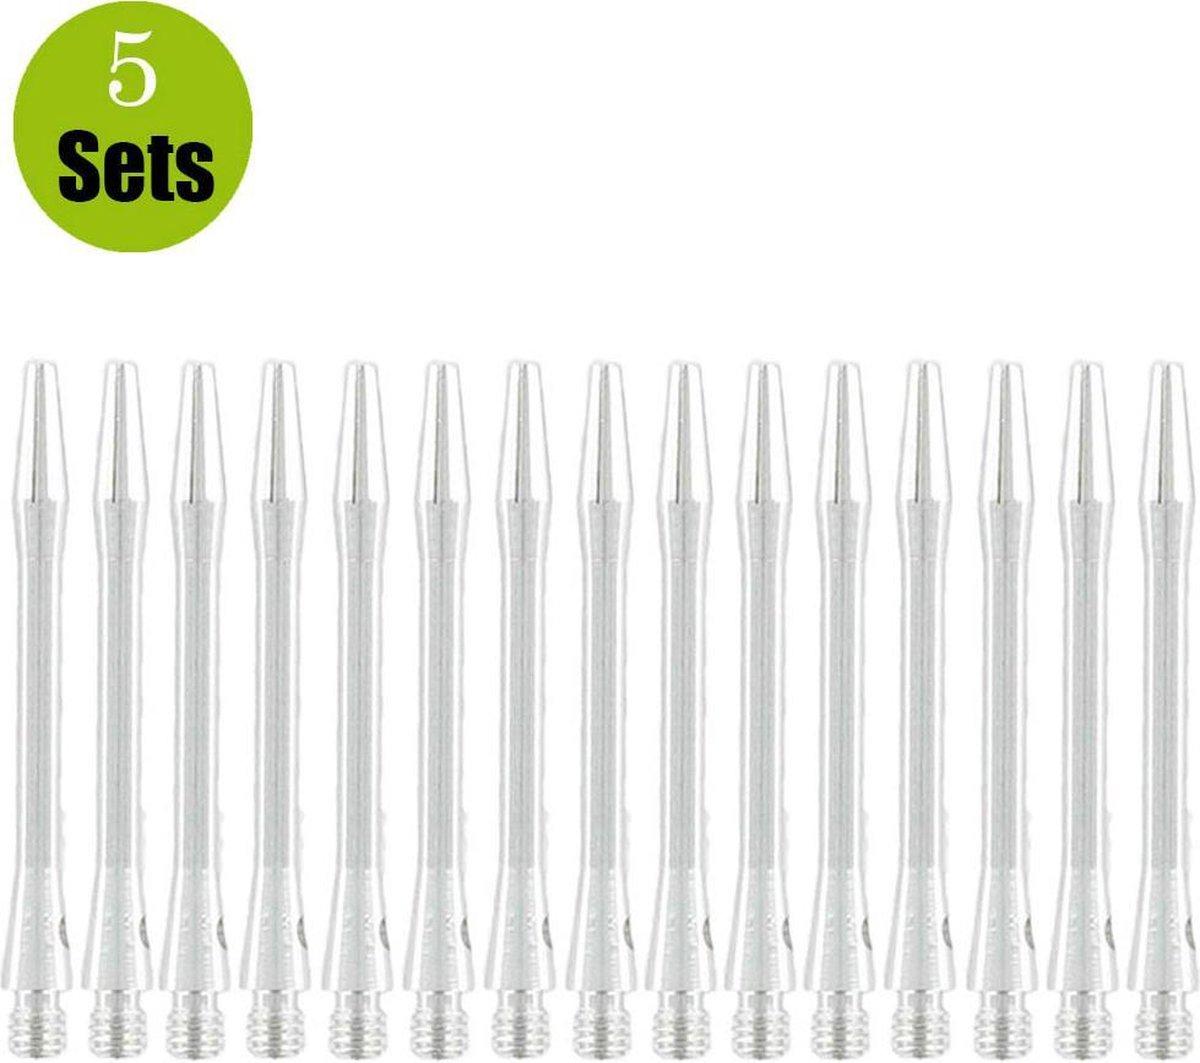 Bulls Aluminium 5sets DartShafts - Zilver - Medium - (5 Sets)